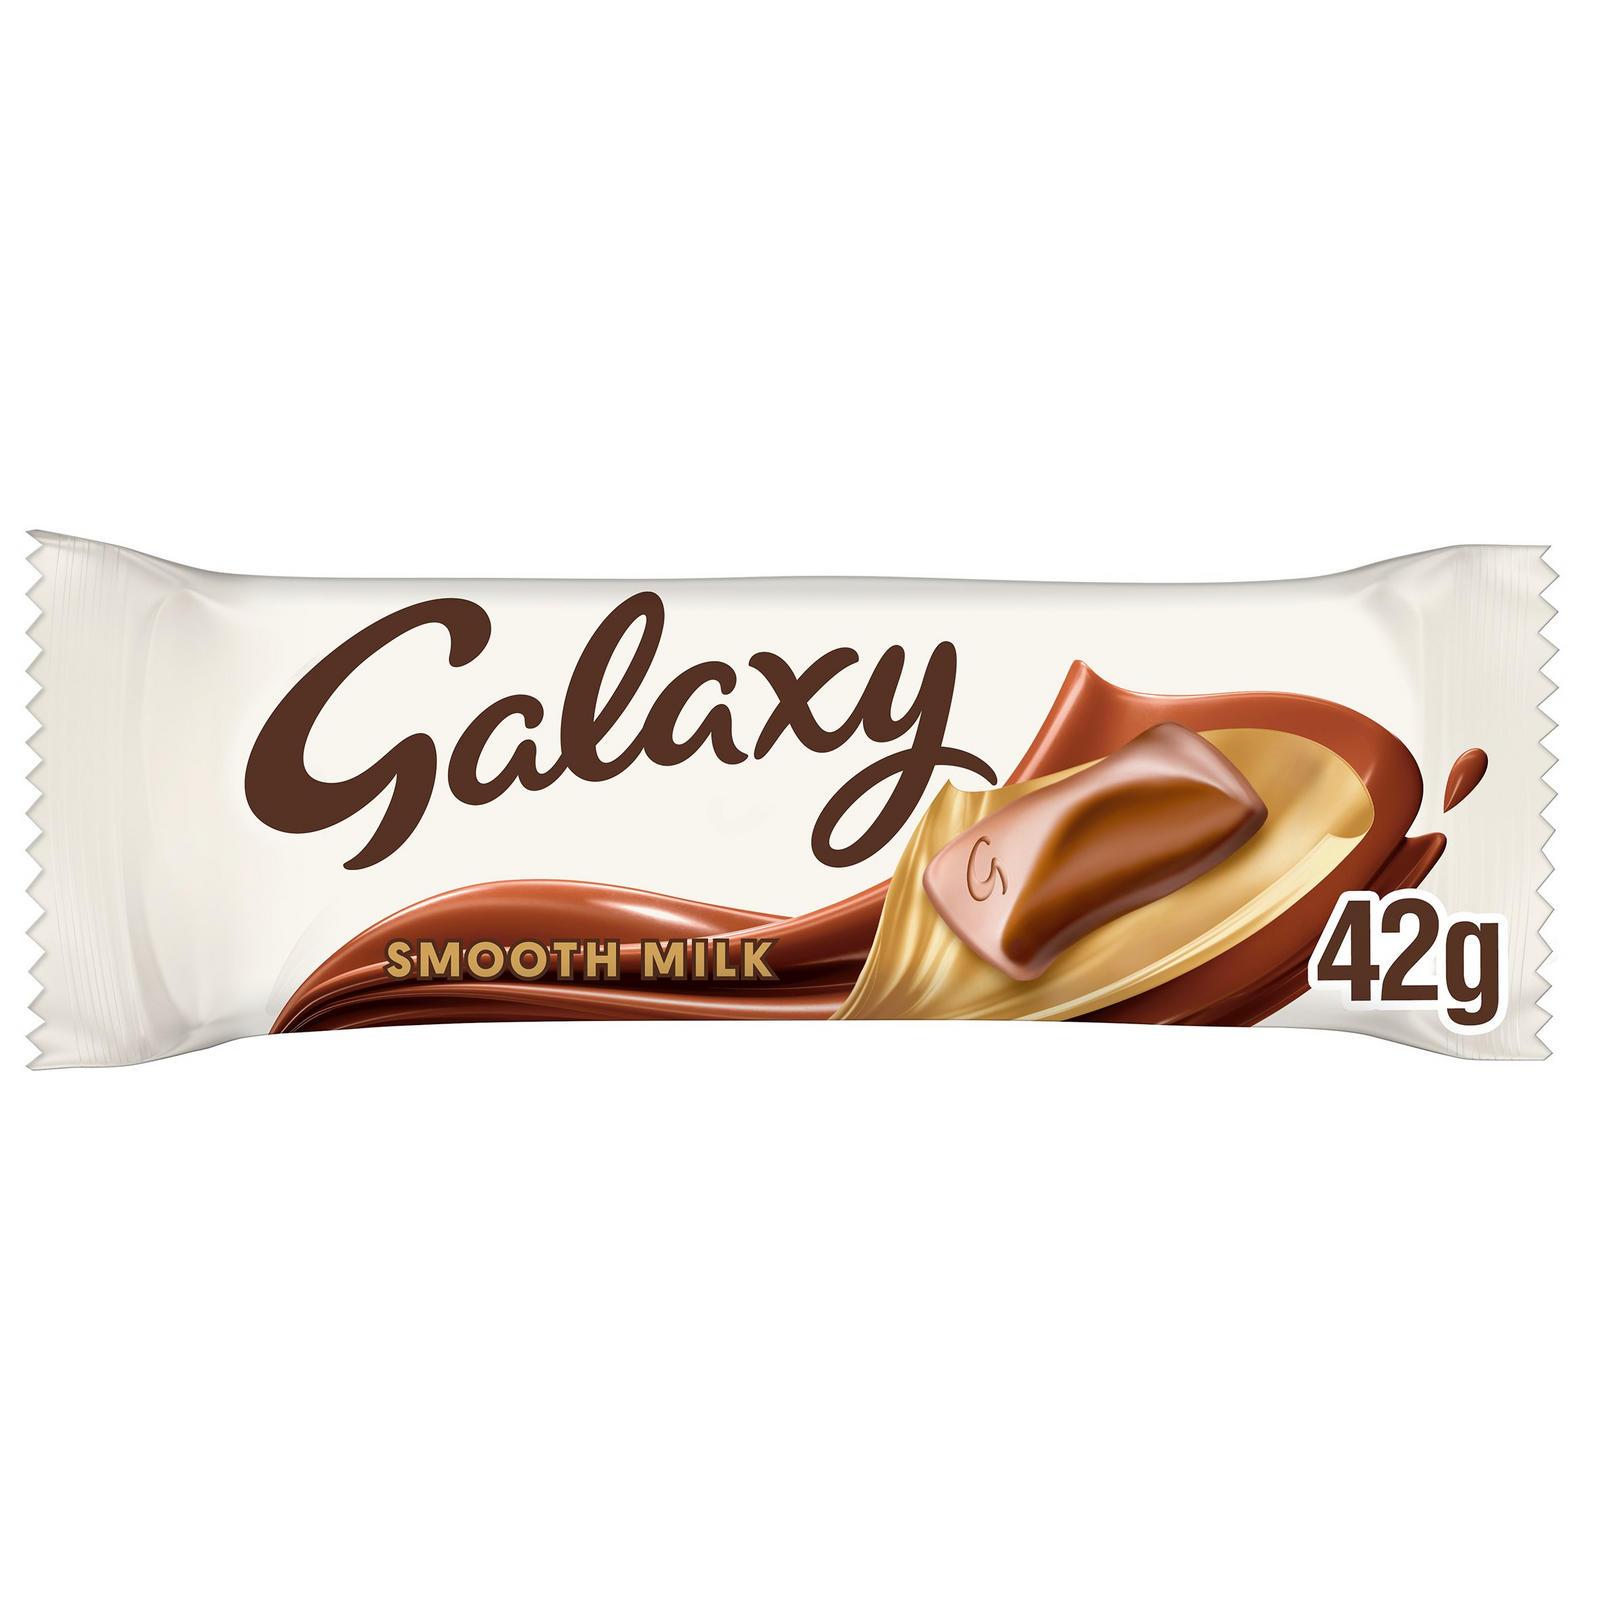 Galaxy Smooth Milk Chocolate Bar 42g   Single Chocolate ...